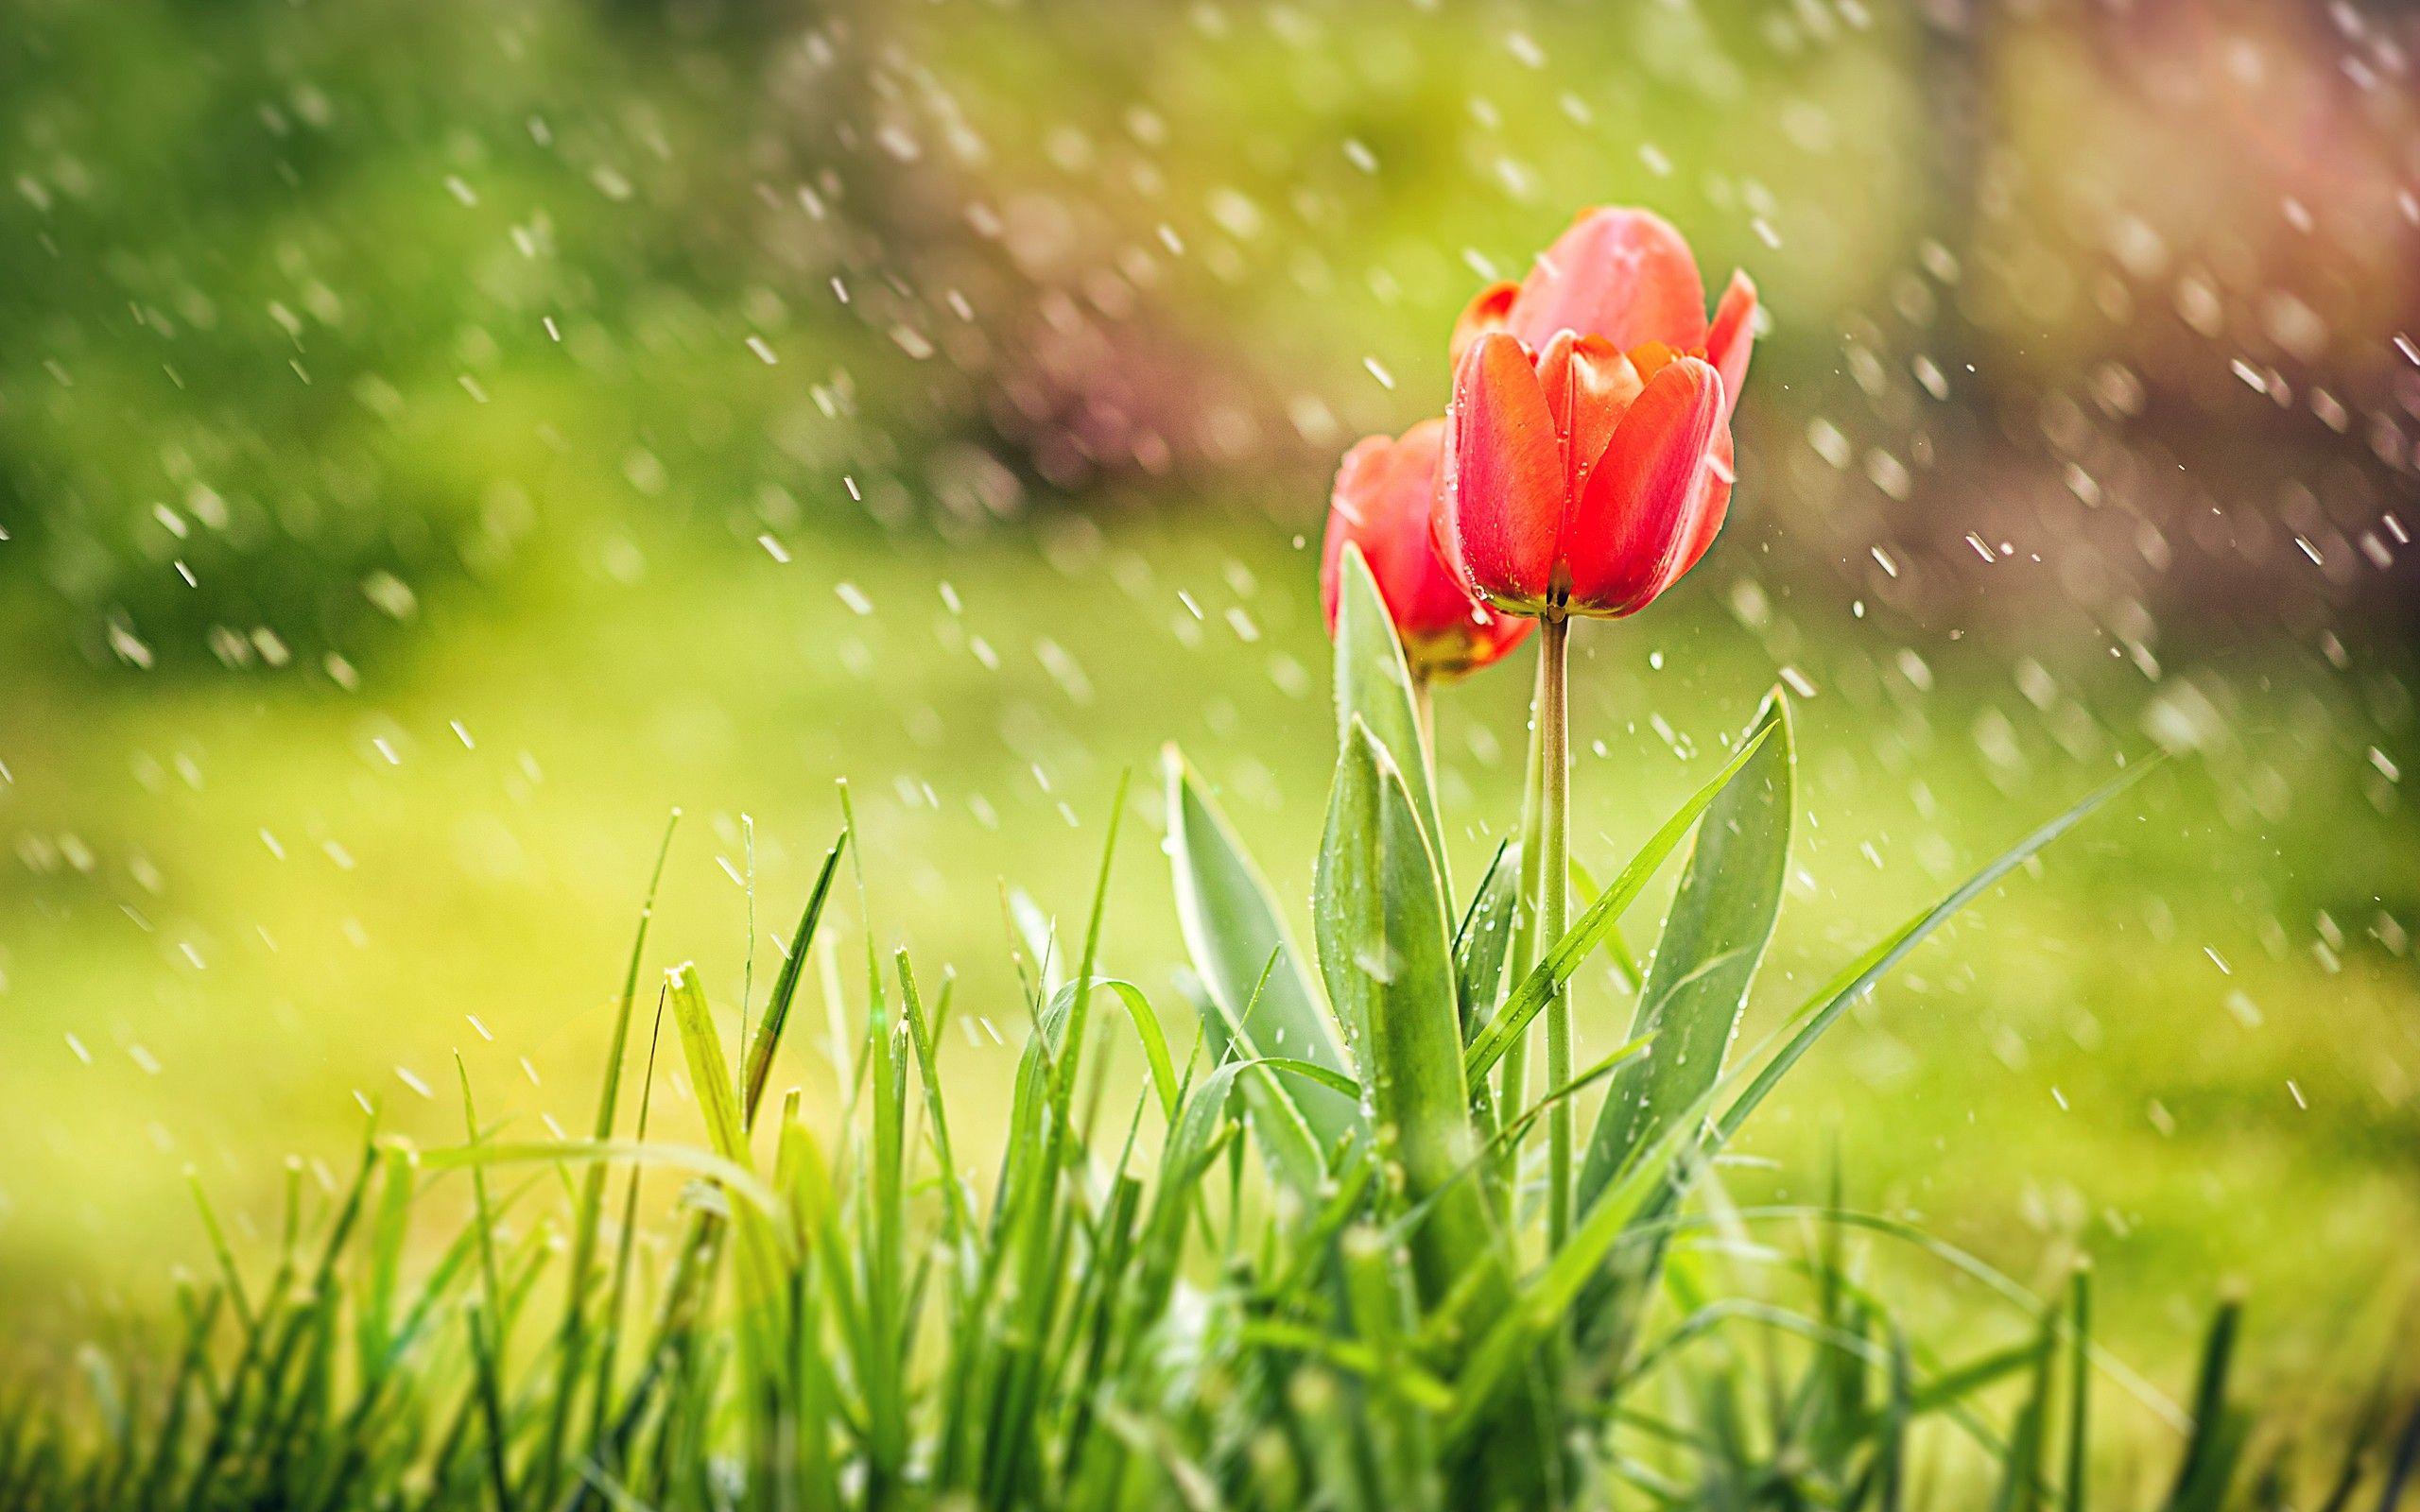 Hd Wallpapers 1080p Nature Pesquisa Google Beautiful Flowers Wallpapers Red Flower Wallpaper Rain Wallpapers